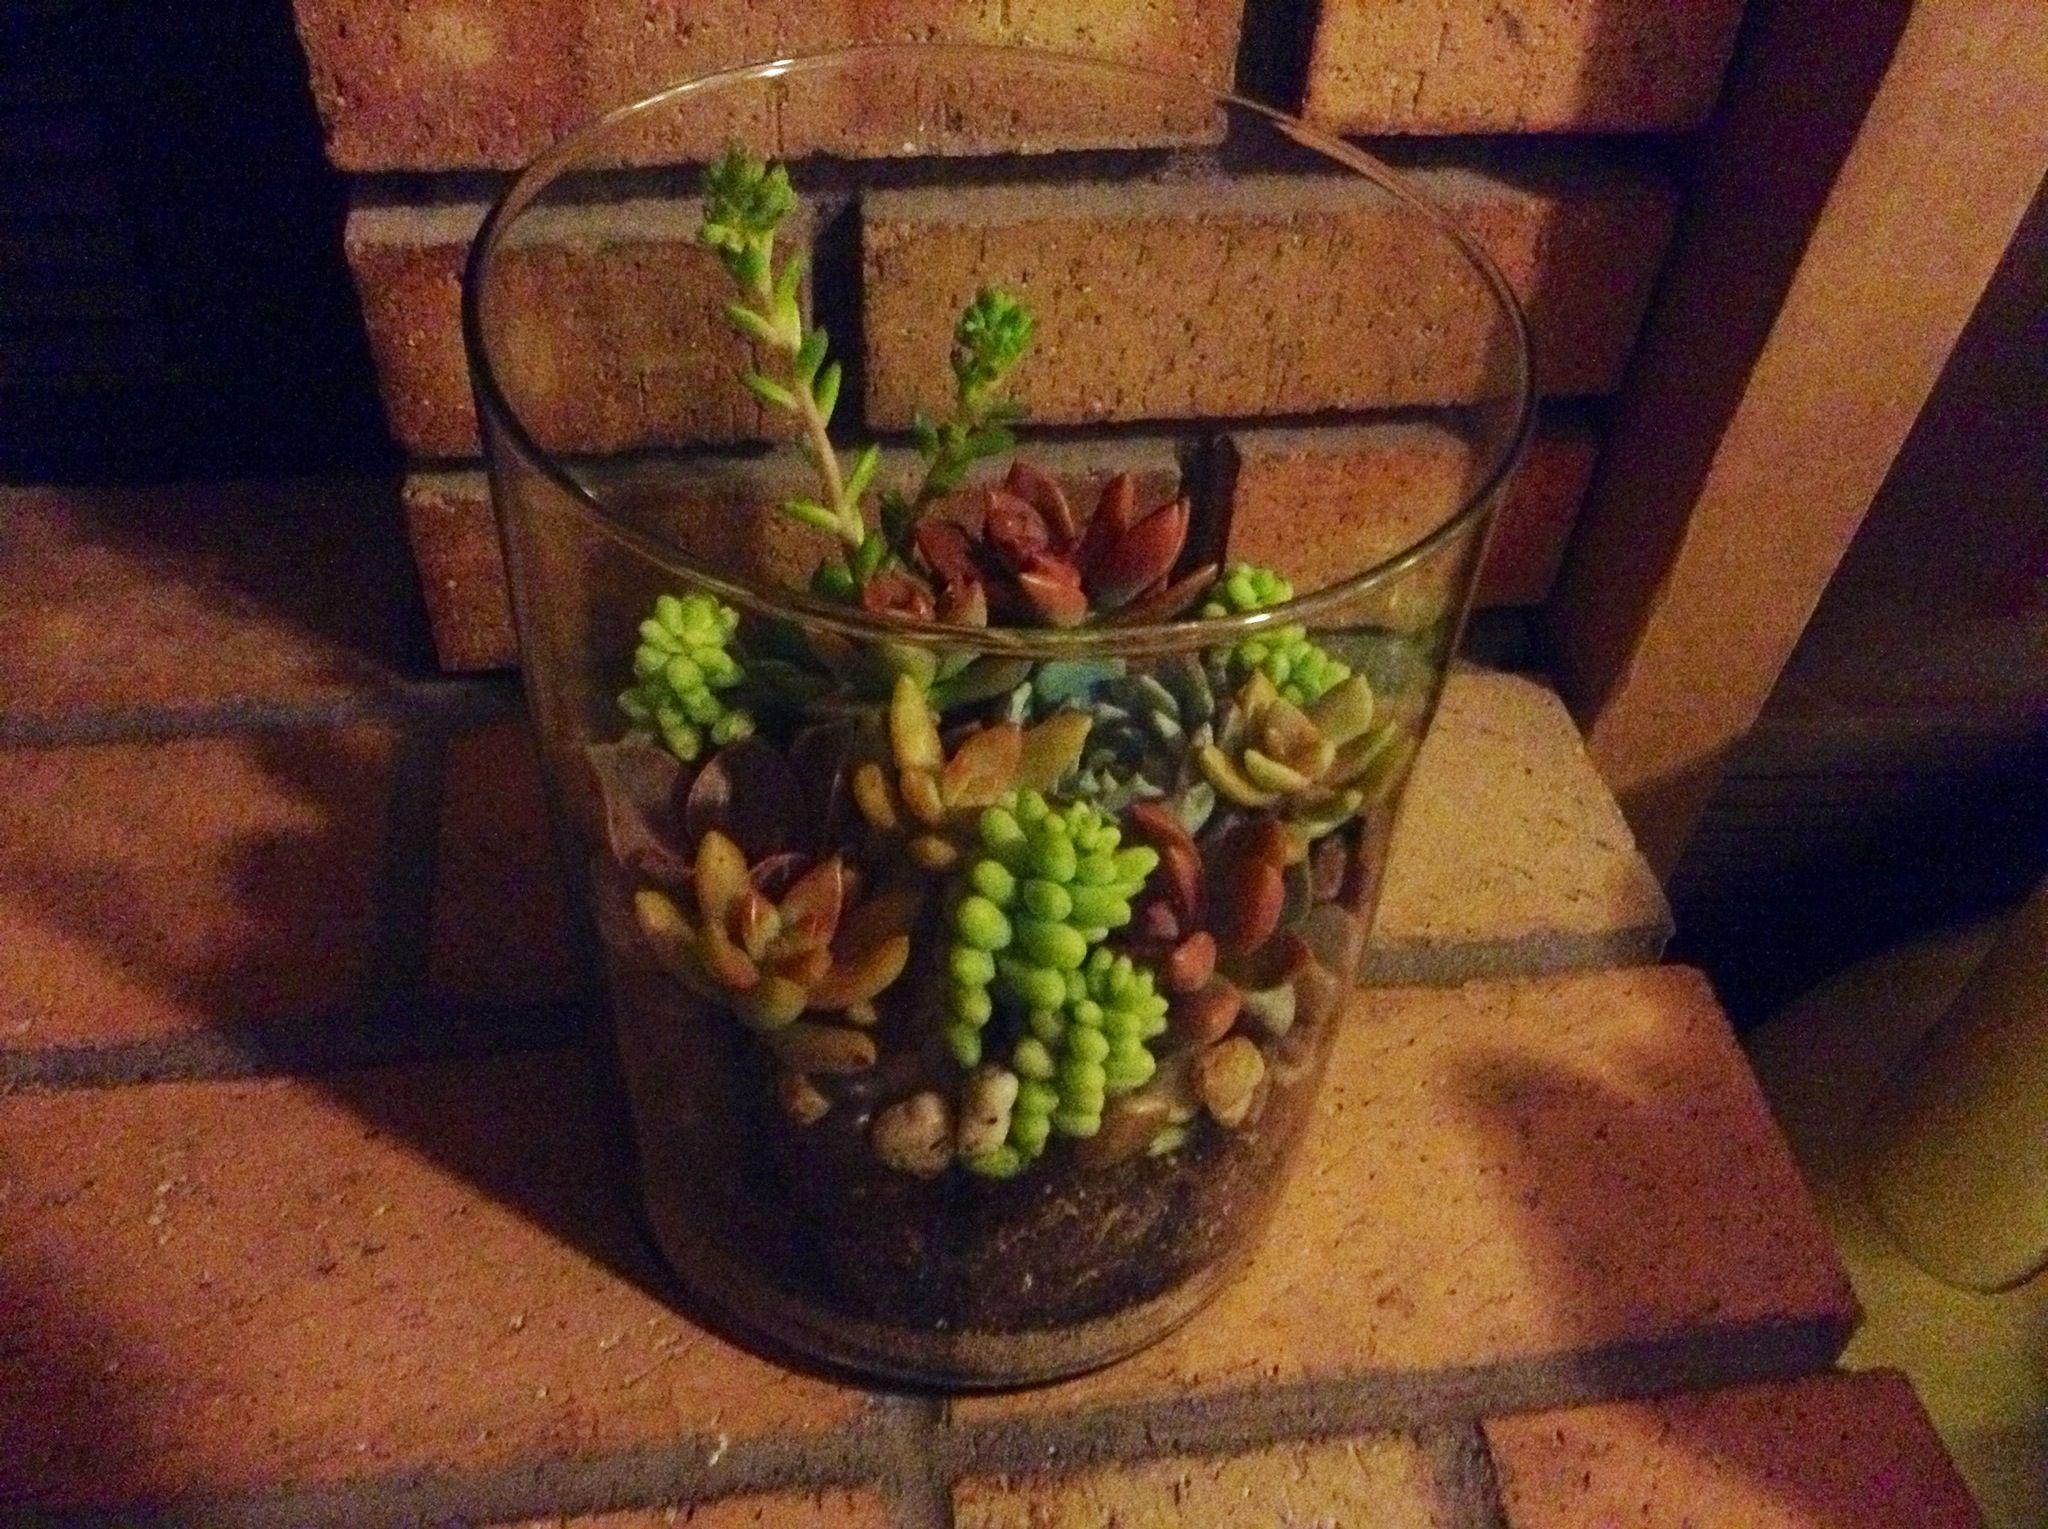 Walmart succulents $8:) | Plants and Garden | Pinterest | Plants and ...